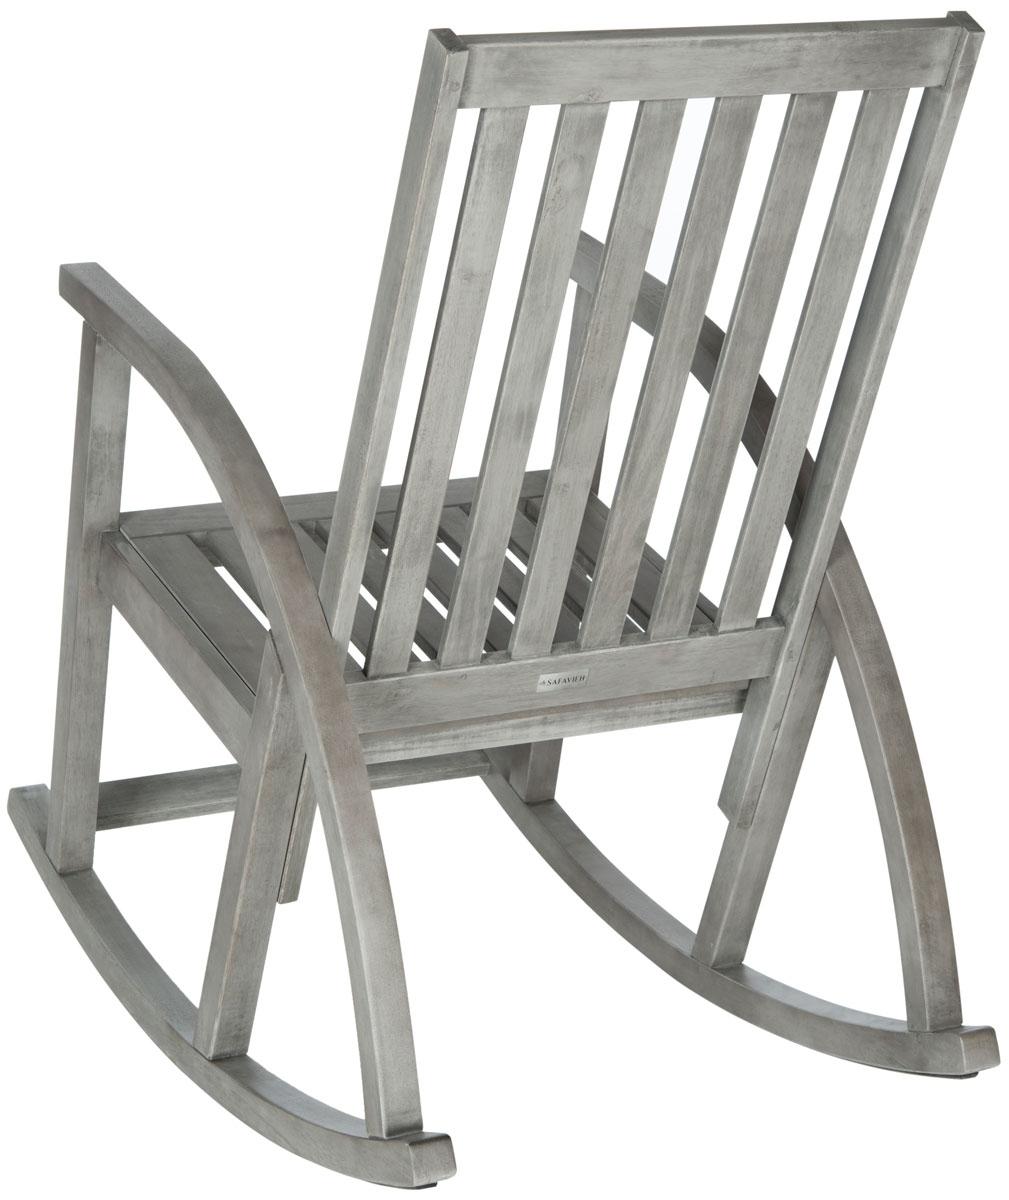 Outdoor Rocking Chairs Furniture Safavieh Back Gray Chair Zen Wooden In Zen Rocking Chairs (View 12 of 15)